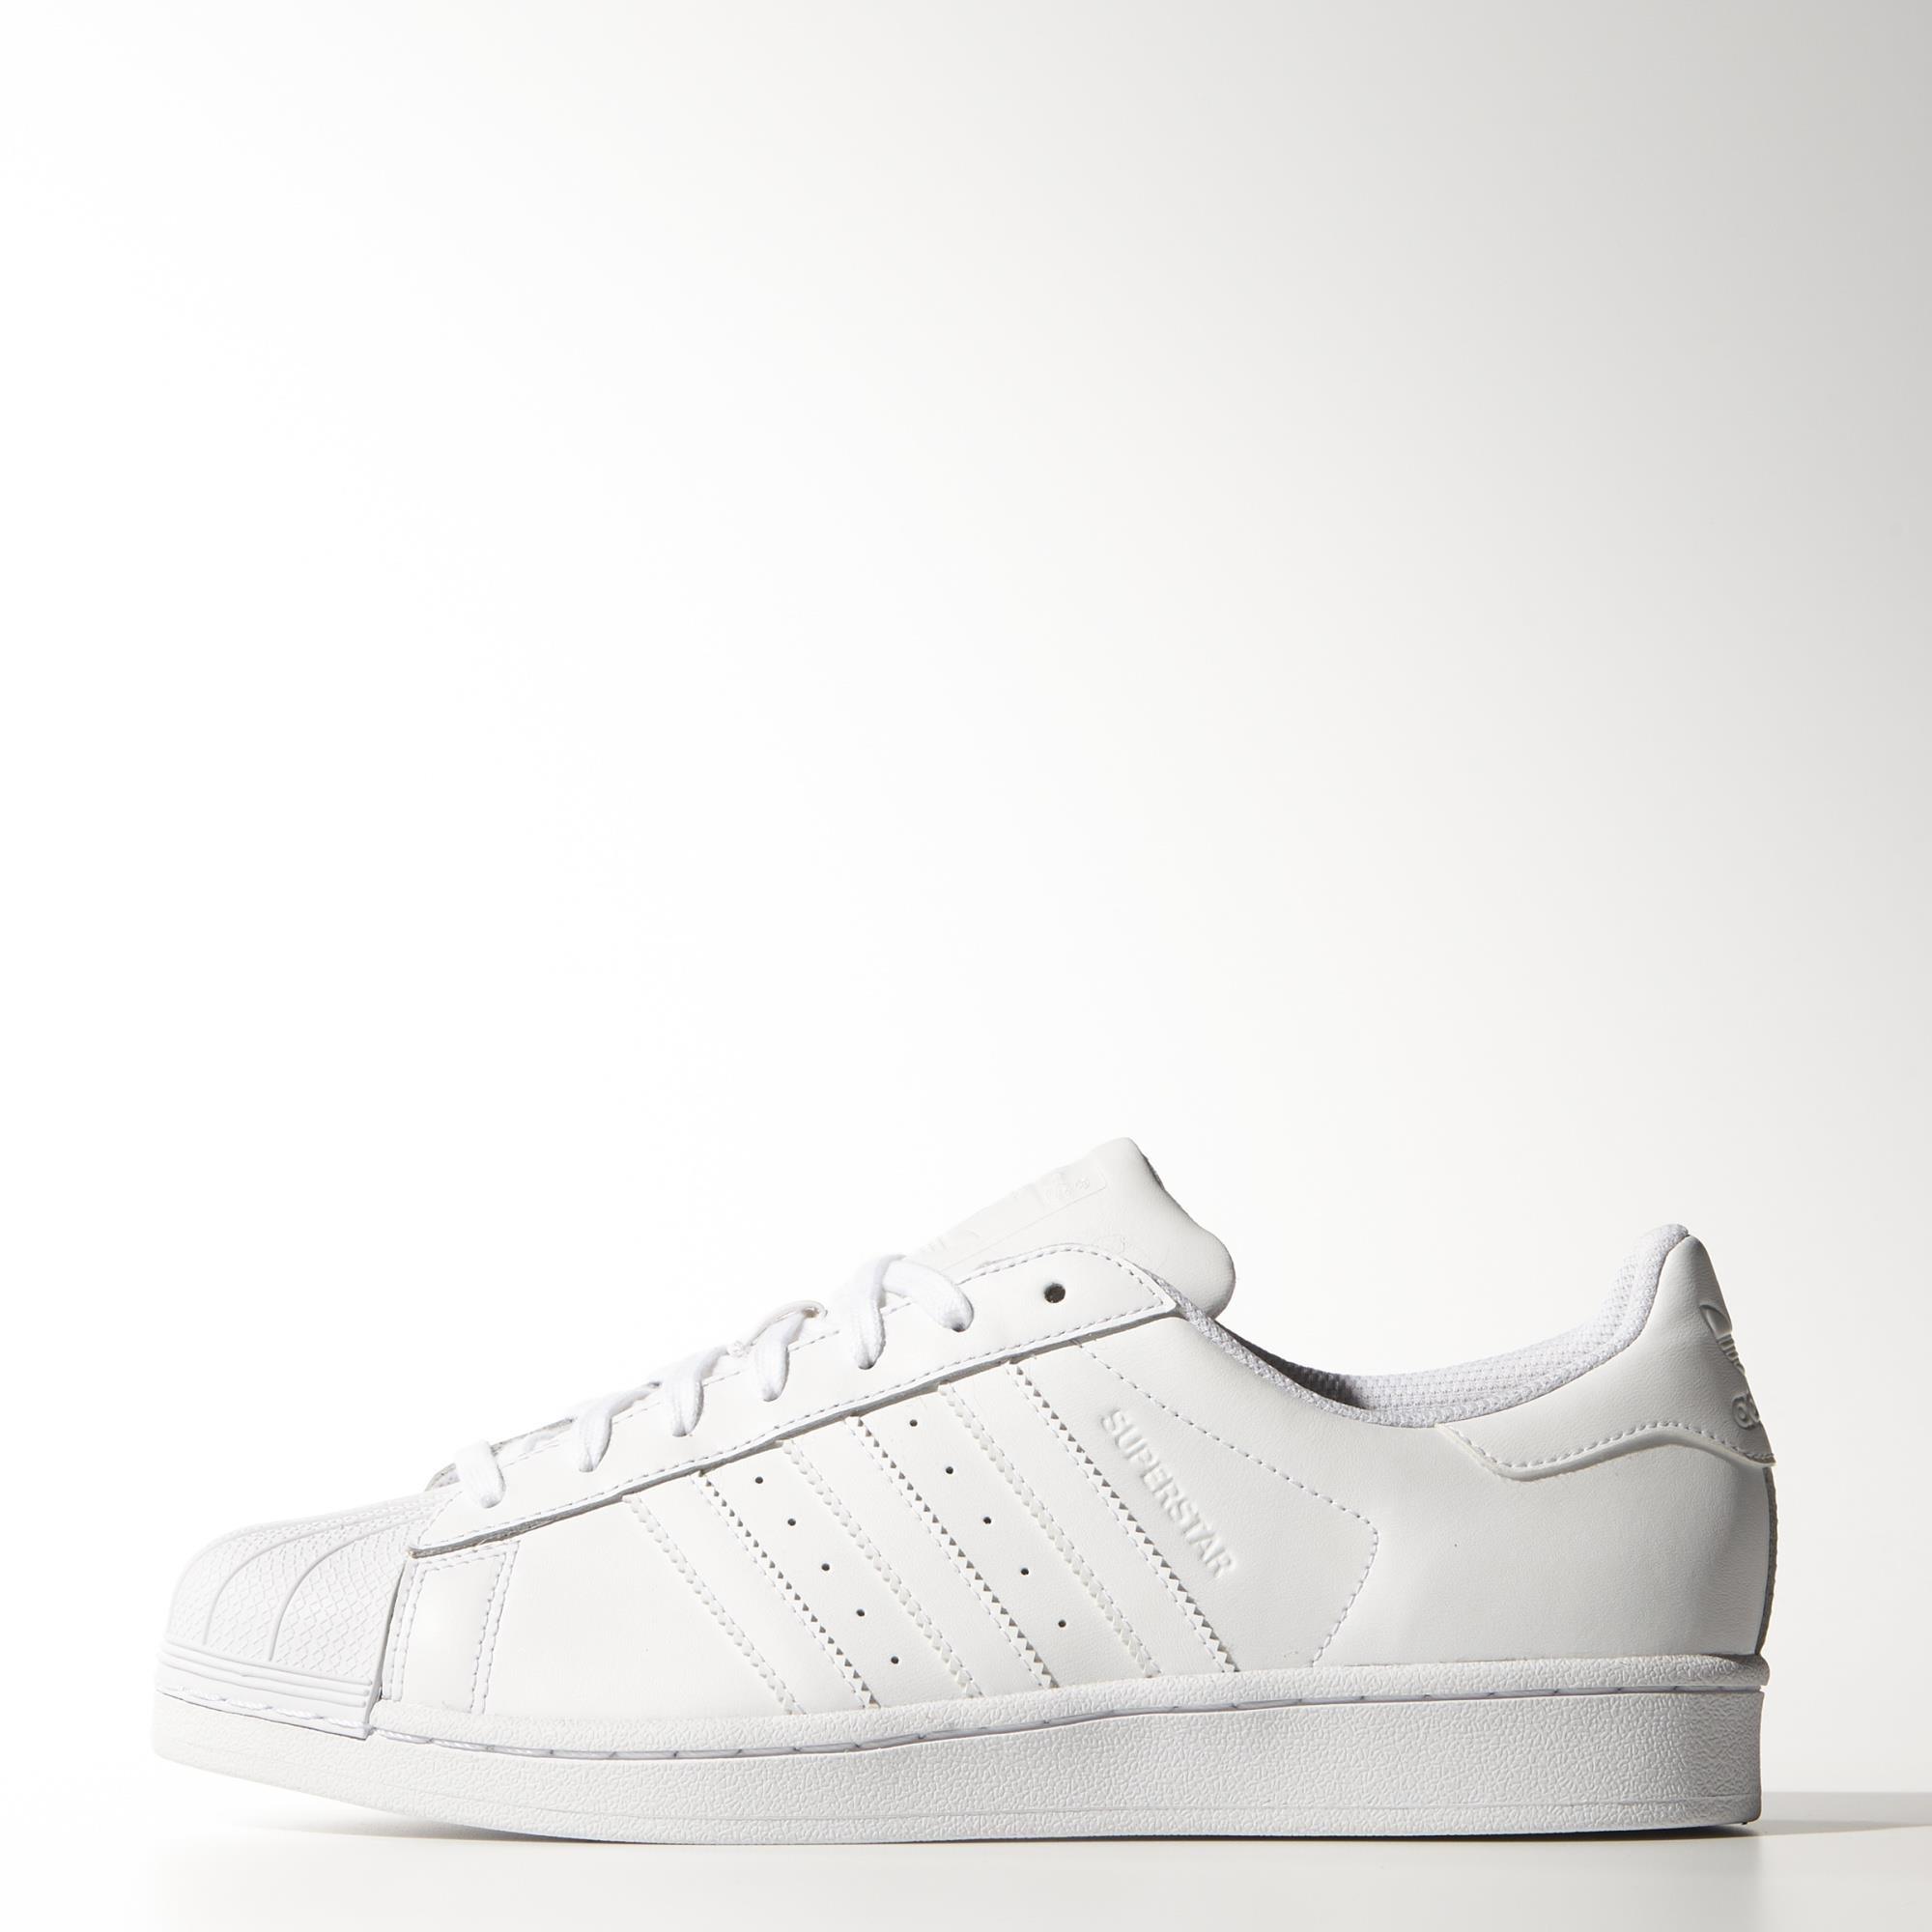 reputable site 22b7e 54153 adidas Superstar Shoes - White  adidas US